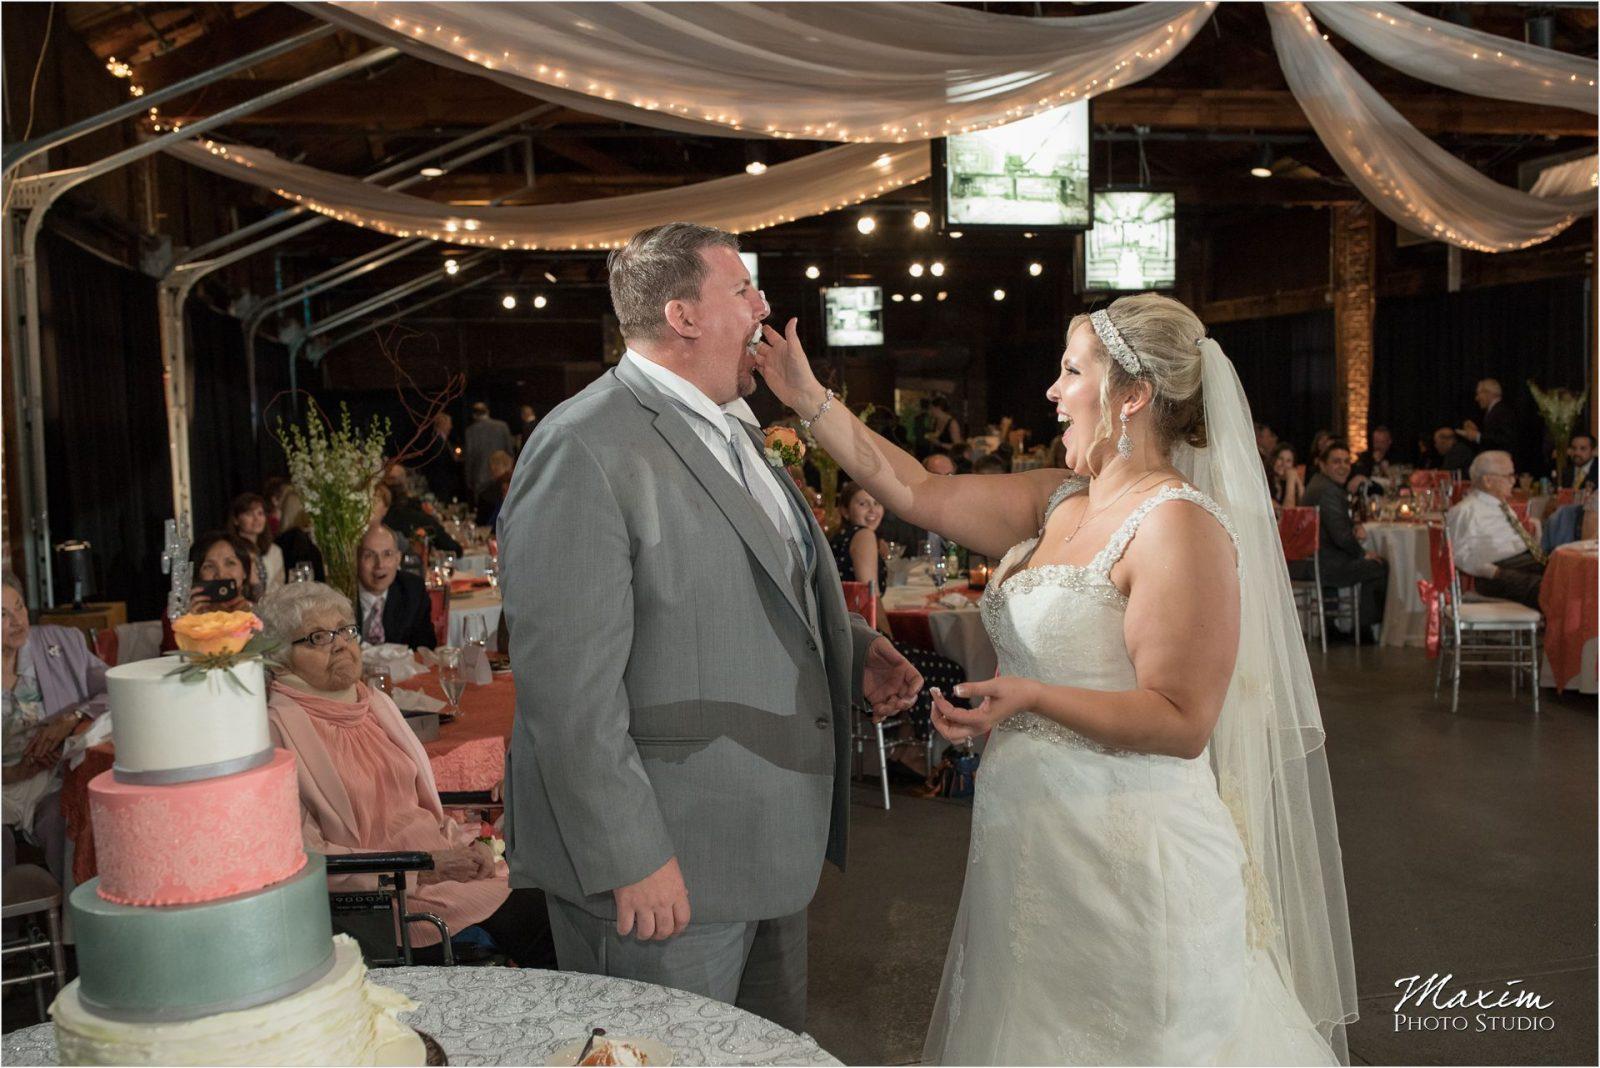 Top of the Market Dayton Ohio Wedding Reception cake